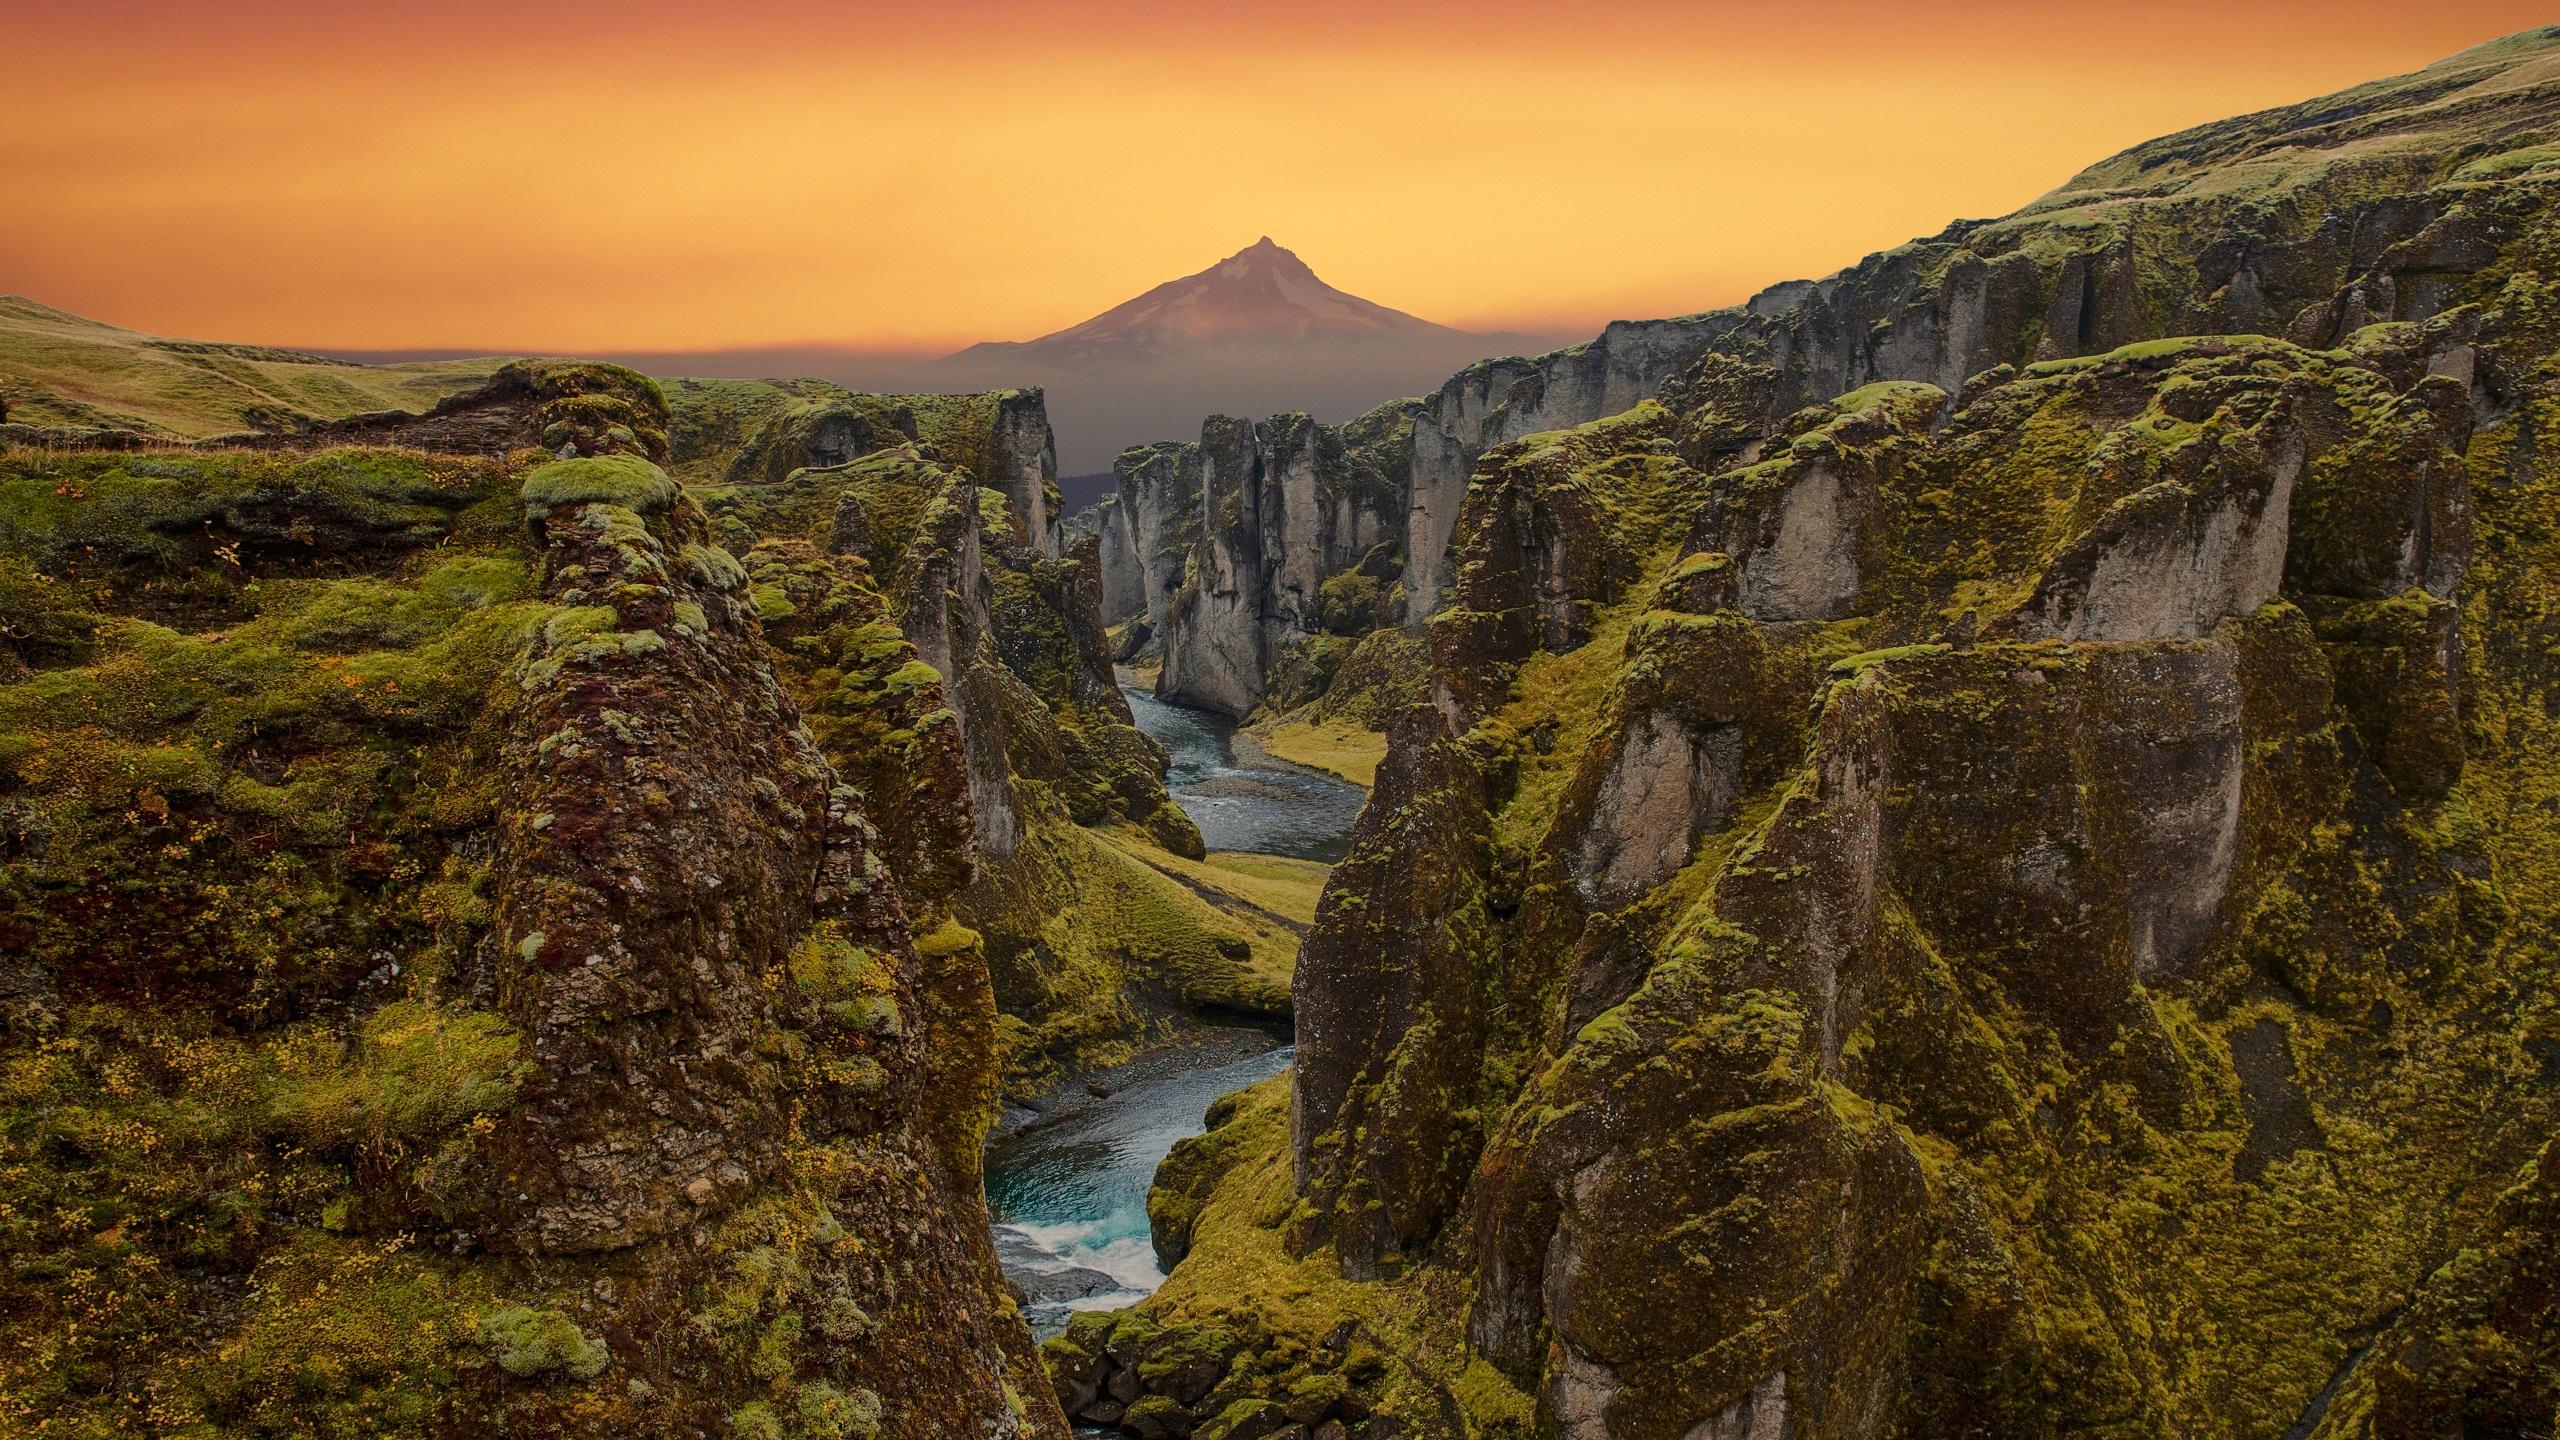 General 2560x1440 nature landscape river mountains sunset